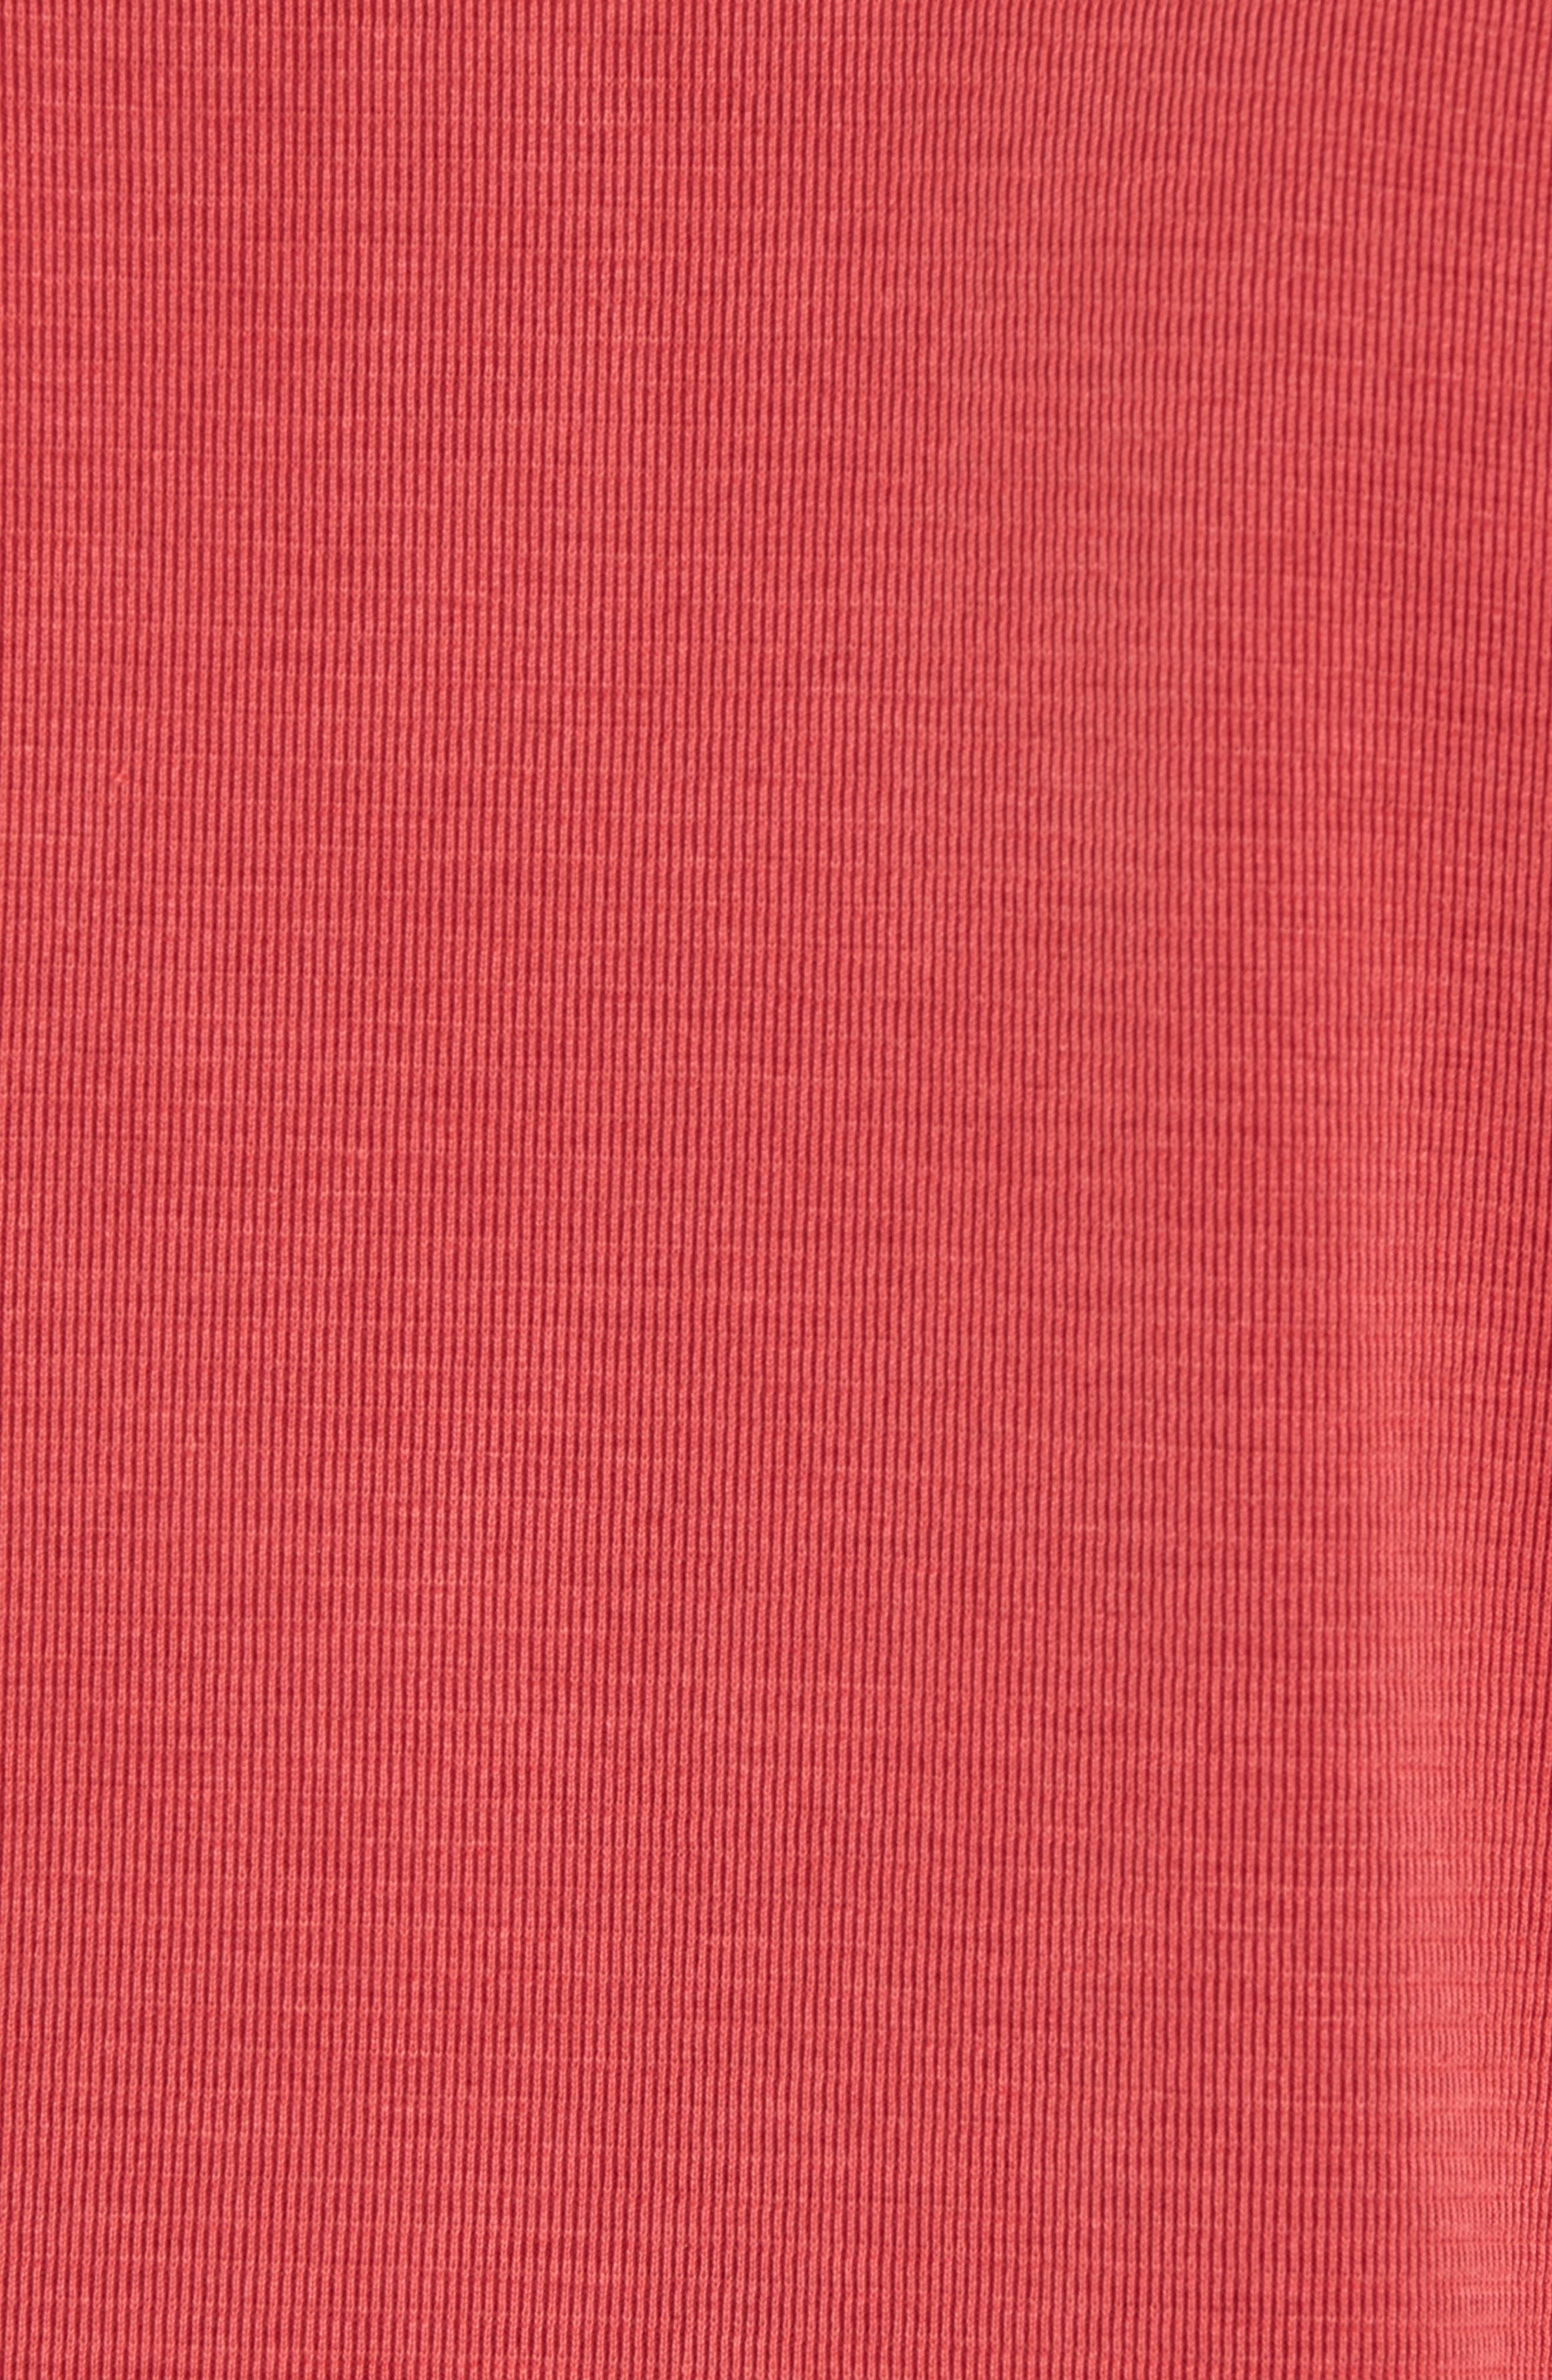 Coastal Crest Polo,                             Alternate thumbnail 54, color,